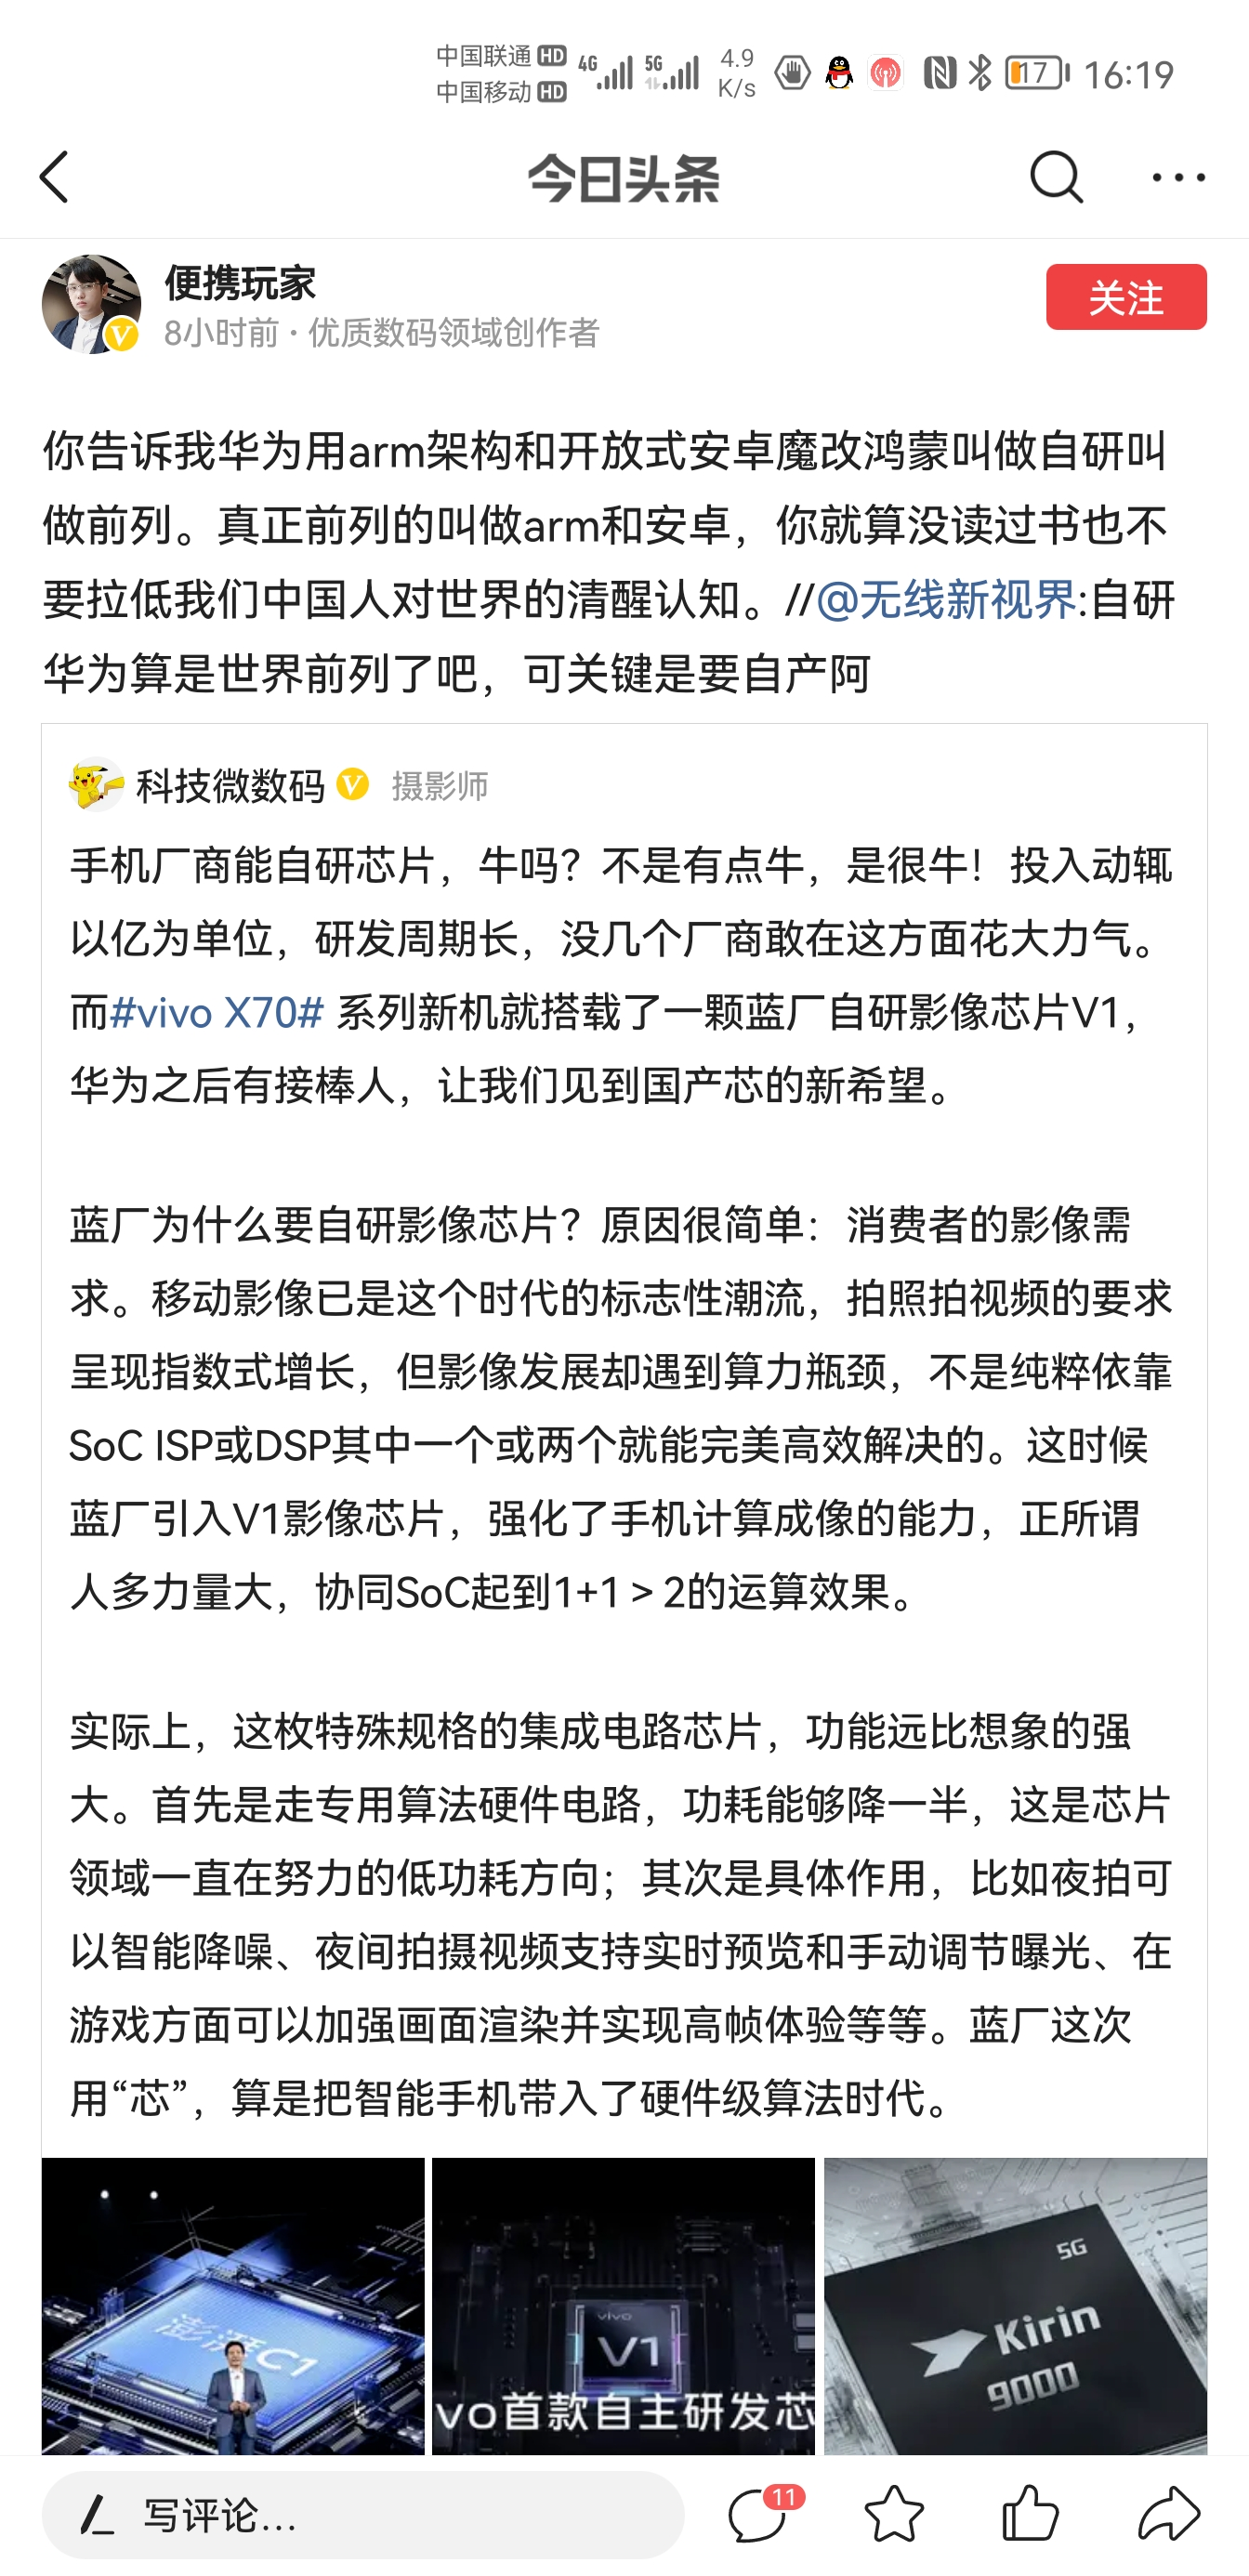 Screenshot_20210917_161903_com.ss.android.article.news.jpg